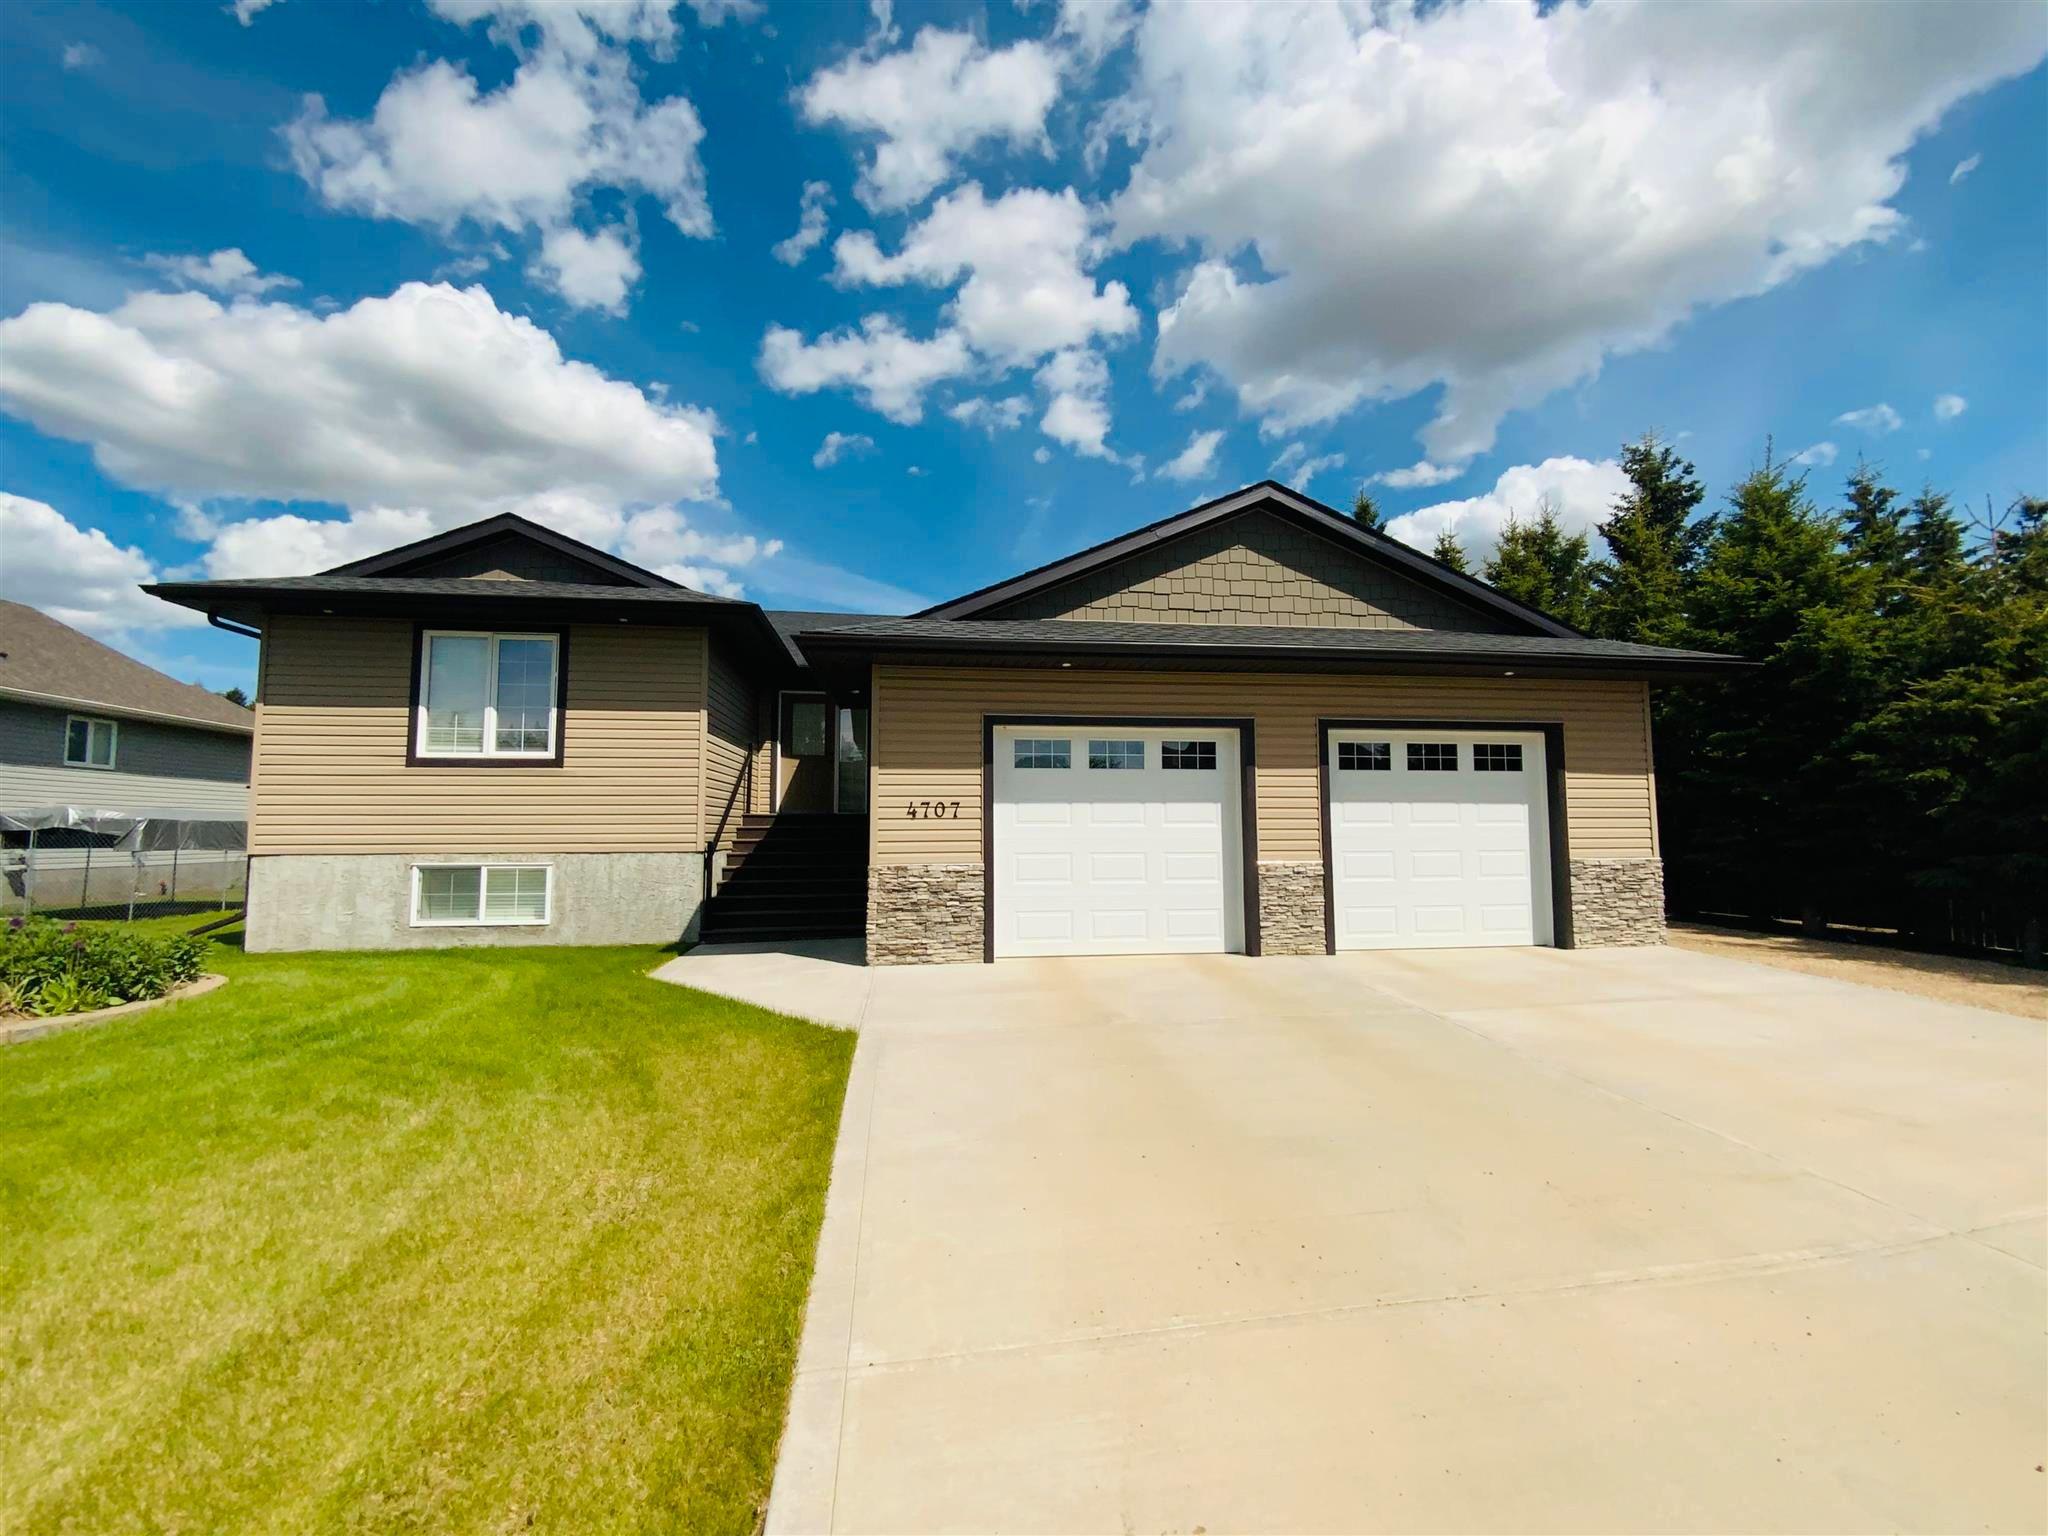 Main Photo: 4707 62 Street: Wetaskiwin House for sale : MLS®# E4227723